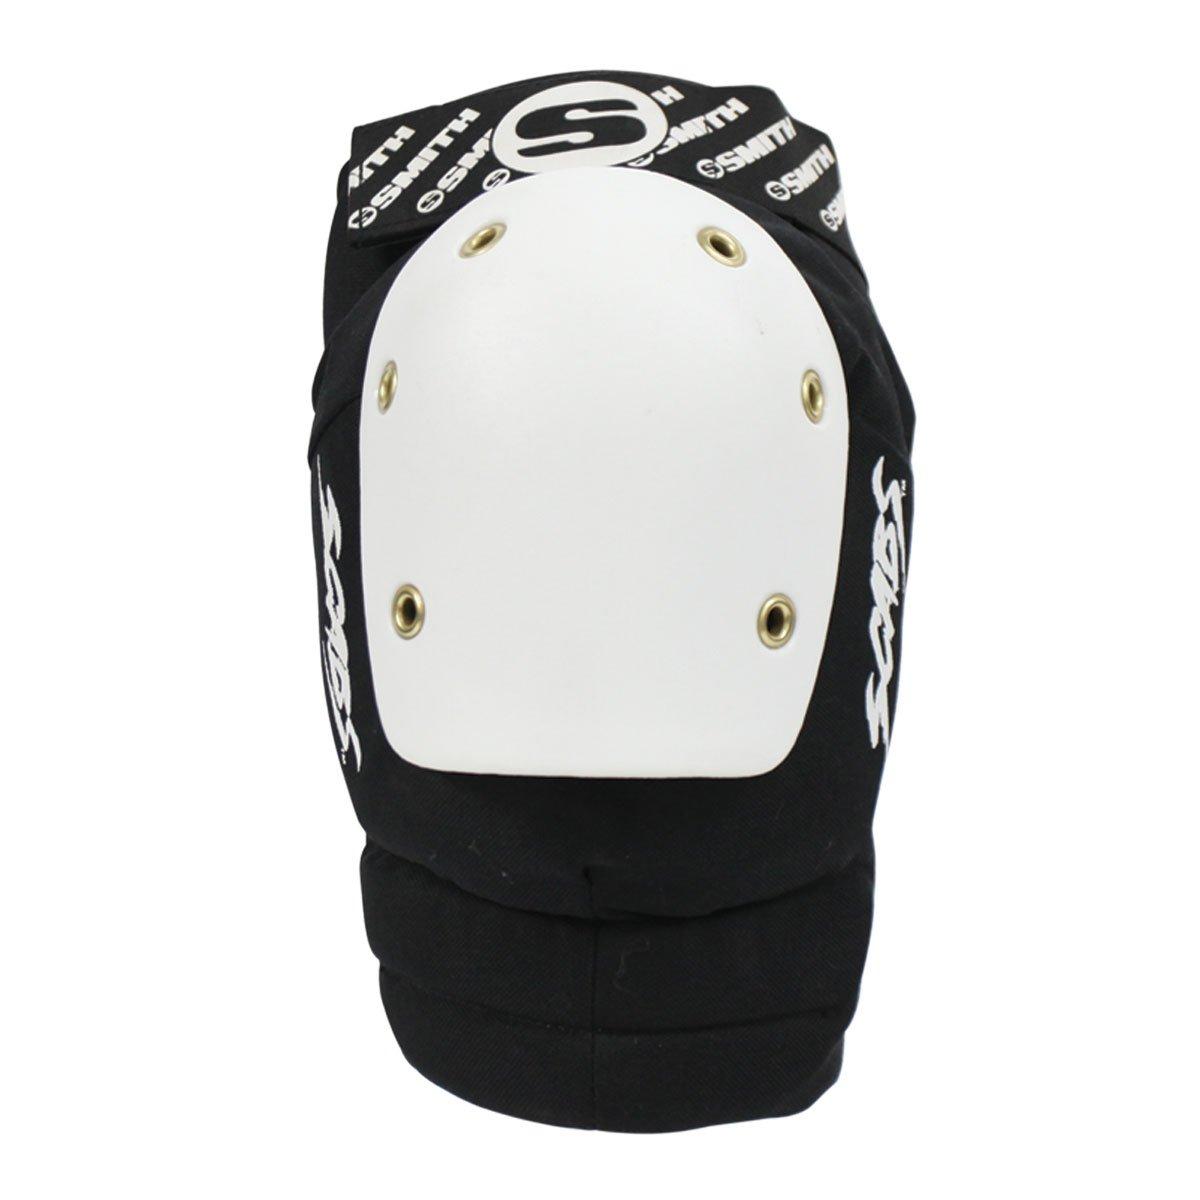 Smith Safety Gear Elite Knee Pads, Black/White, Small/Medium